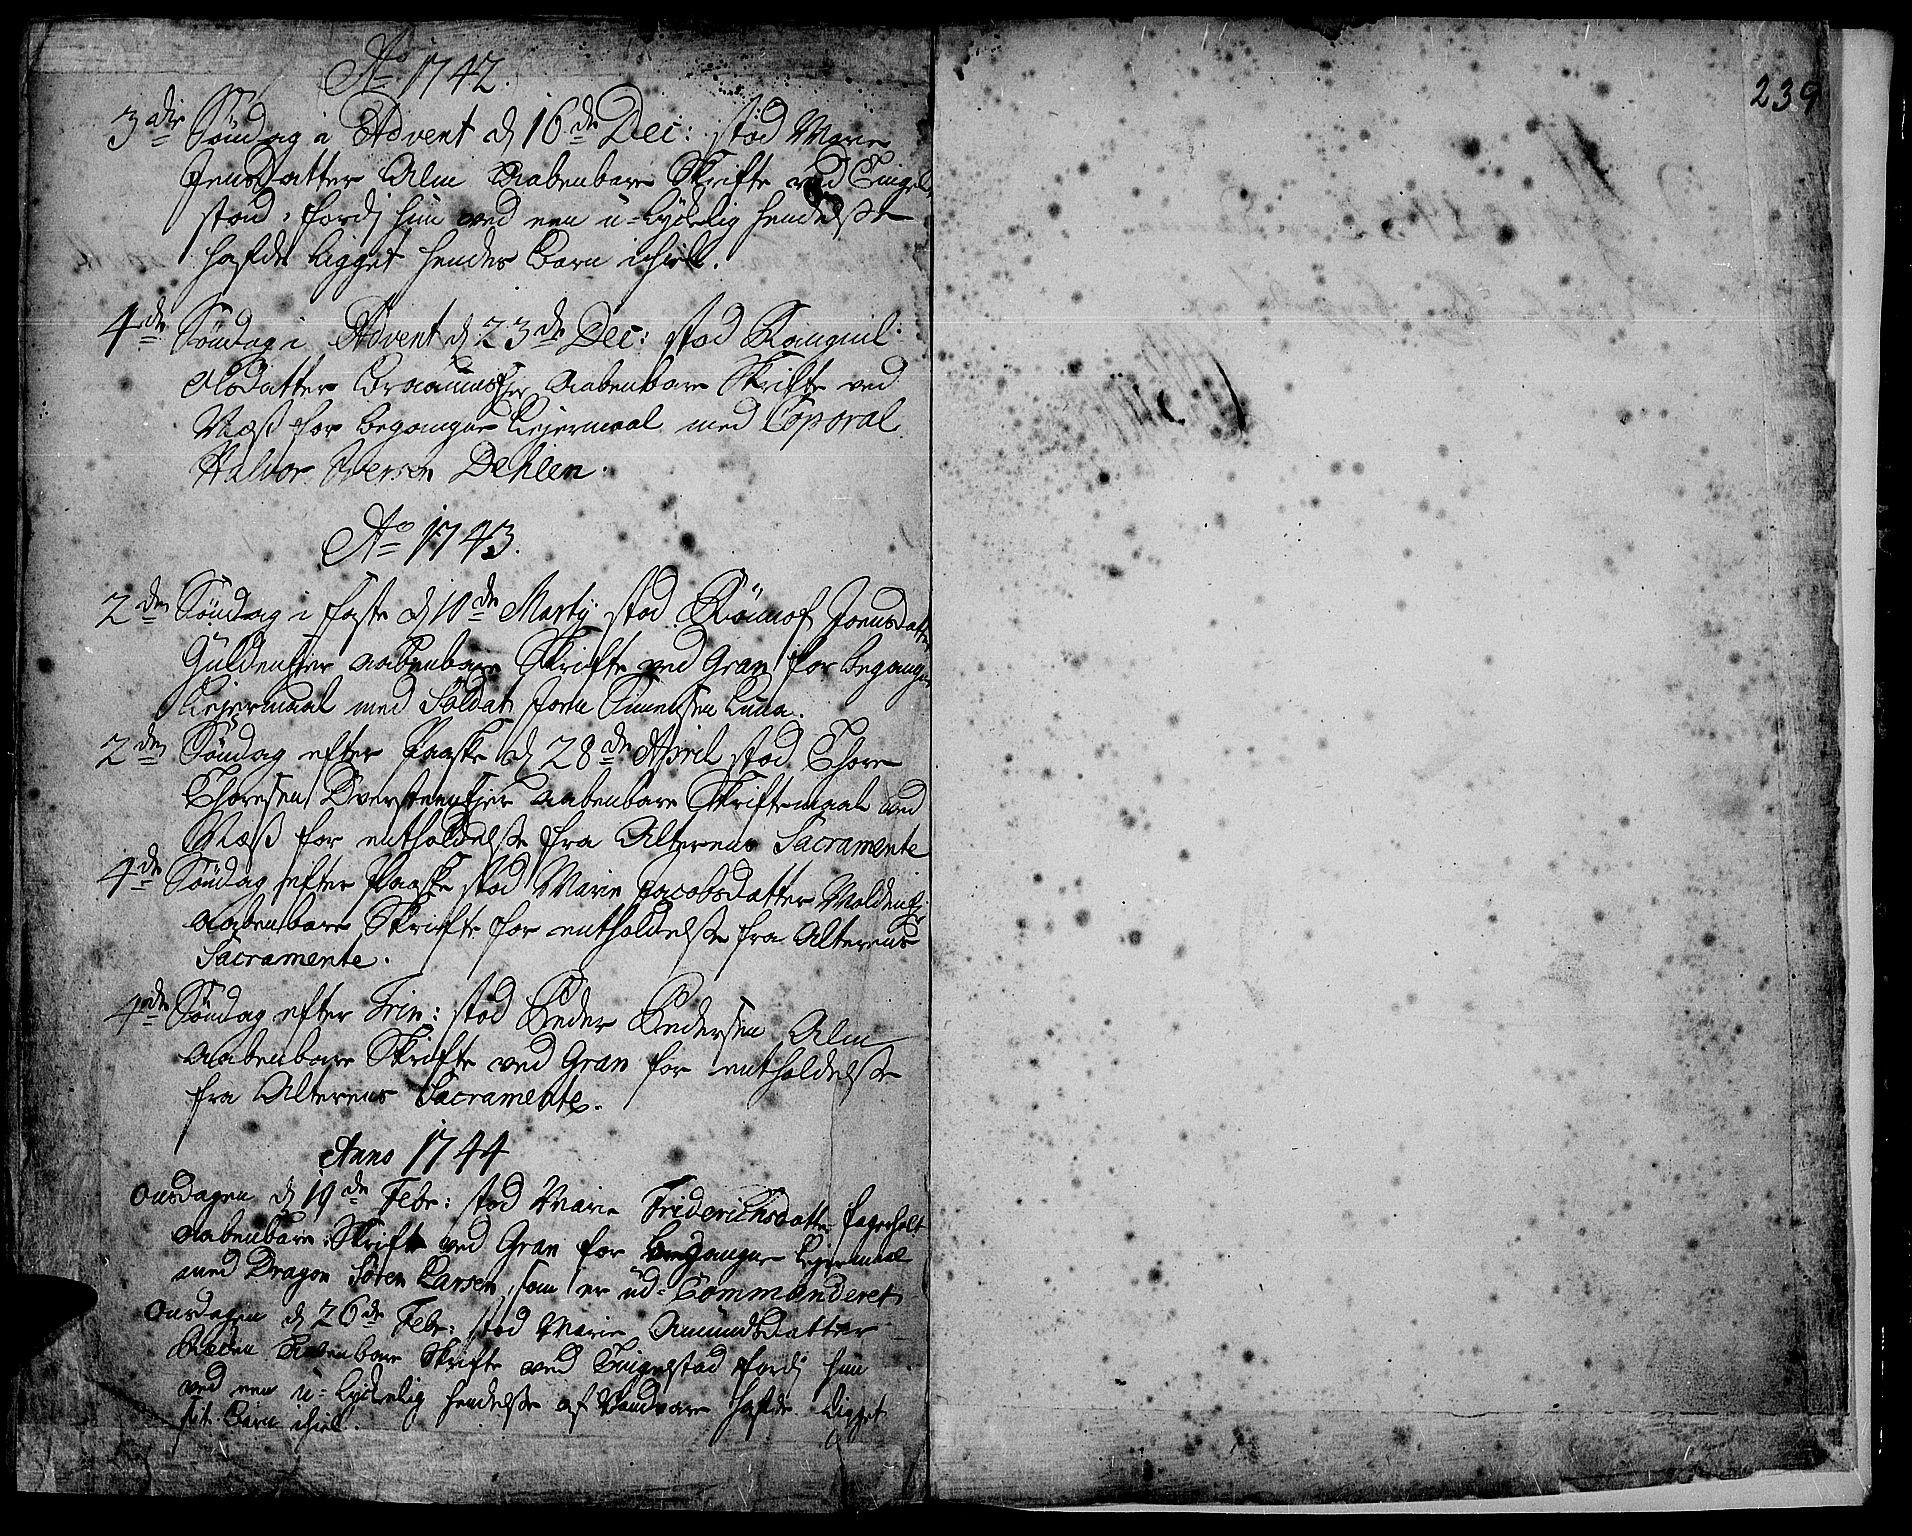 SAH, Gran prestekontor, Ministerialbok nr. 2, 1732-1744, s. 239